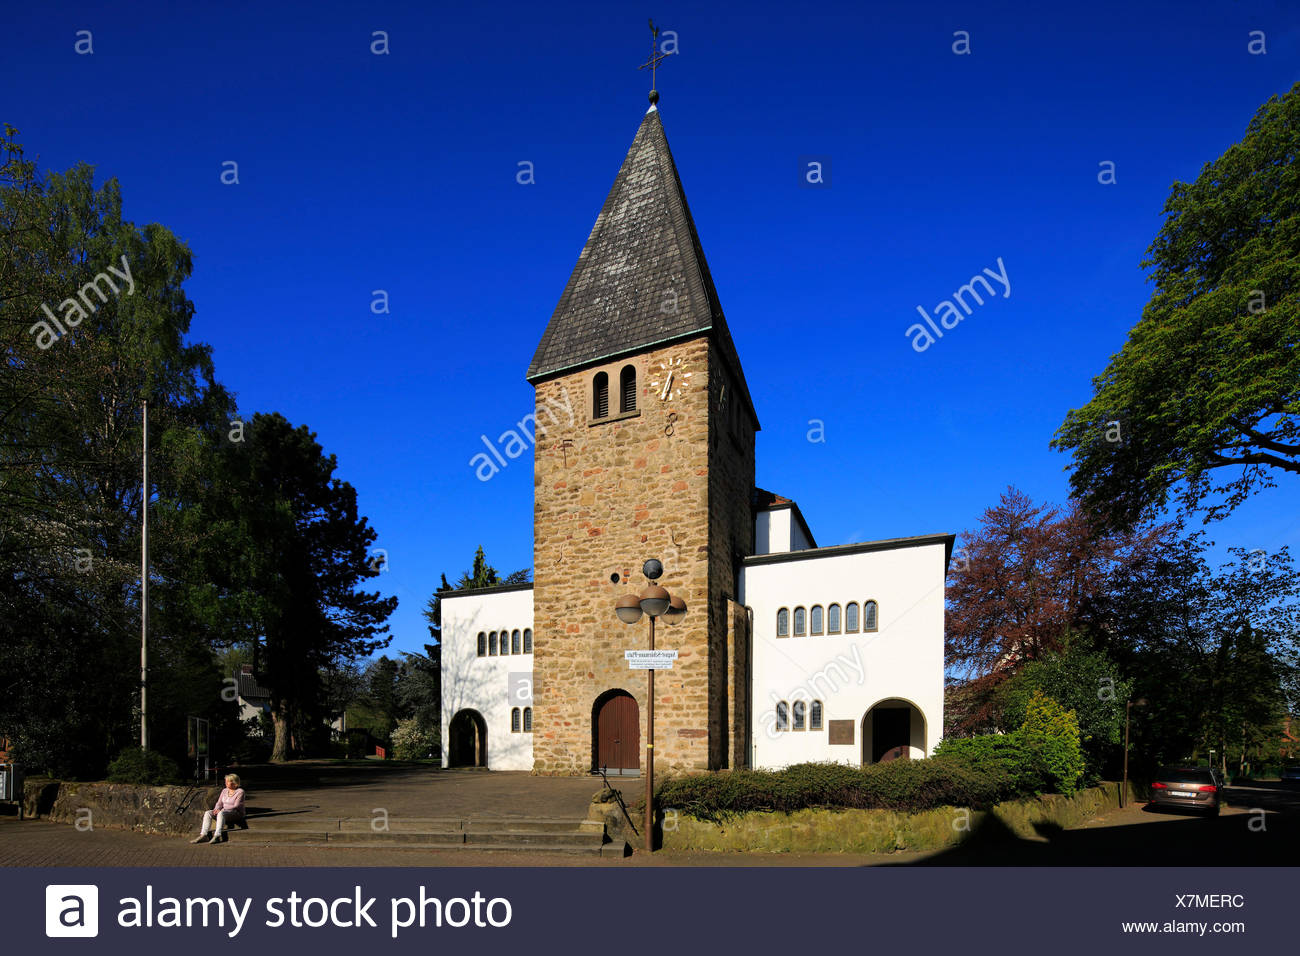 Kirche St. Peter und Paul in Oer-Erkenschwick, Ruhrgebiet, Nordrhein-Westfalen Stockbild